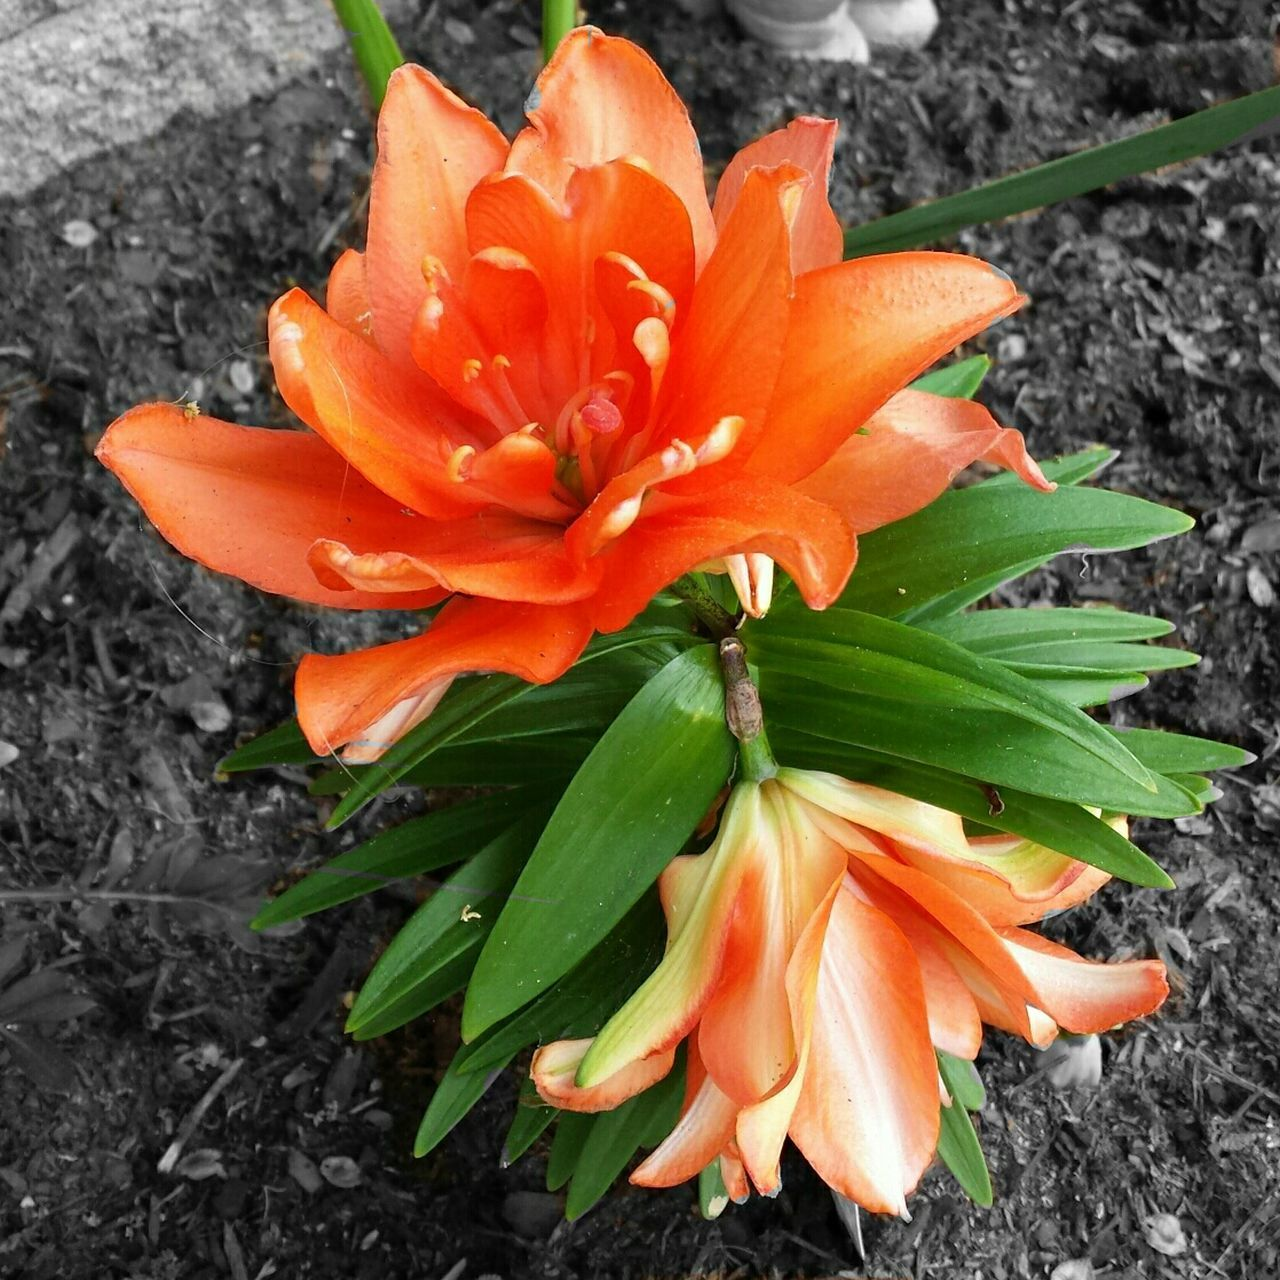 Orange By Motorola Flowers,Plants & Garden Flowers Flowerpower Blackandwhitebutnot Check This Out Orange Orange Flower Orang